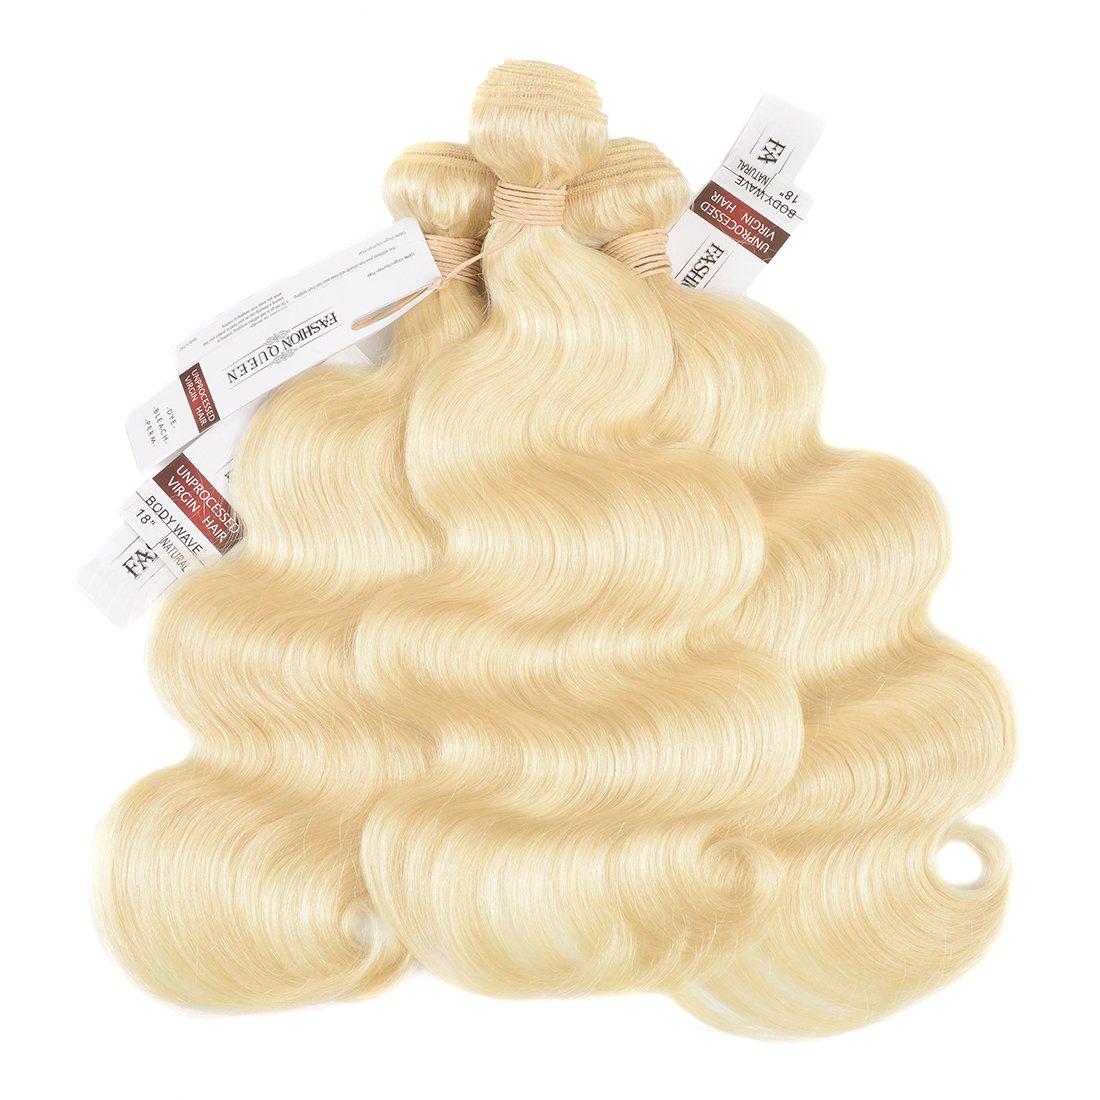 FASHION QUEEN Hair 613 Blonde Hair Bundles, Silk Body Wave Brazilian Virgin Hair, Honey Blonde Unprocessed Human Hair Weave 3 Bundles 300g Mixed Length 16 18 18 Inch